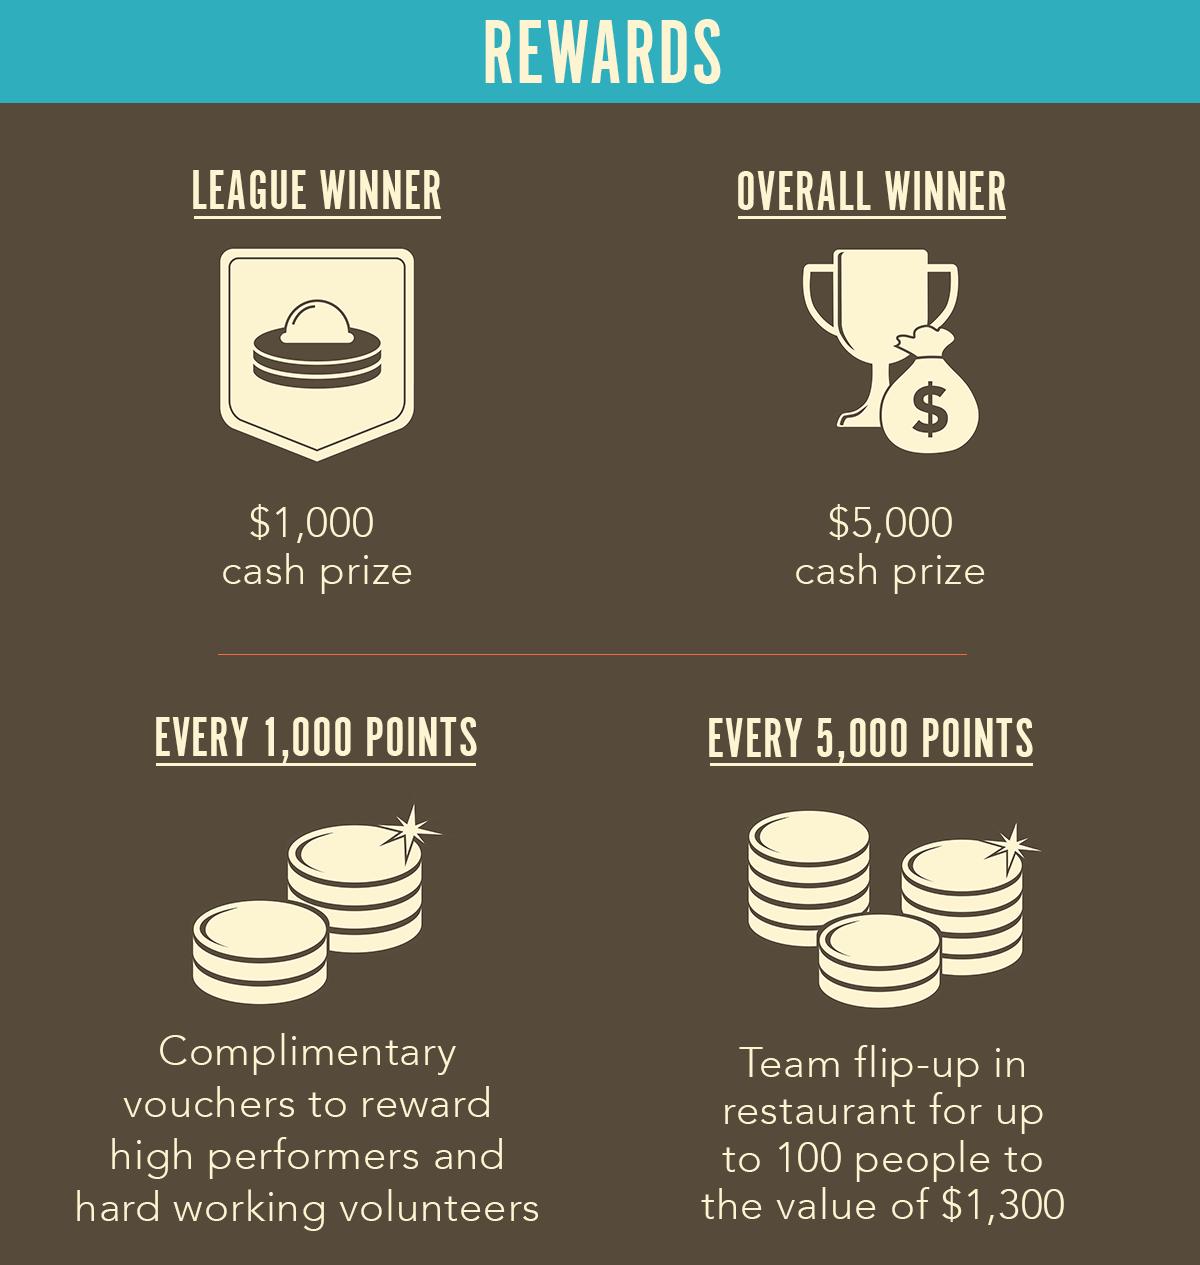 club-rewards-website-rewards-grid-3.png